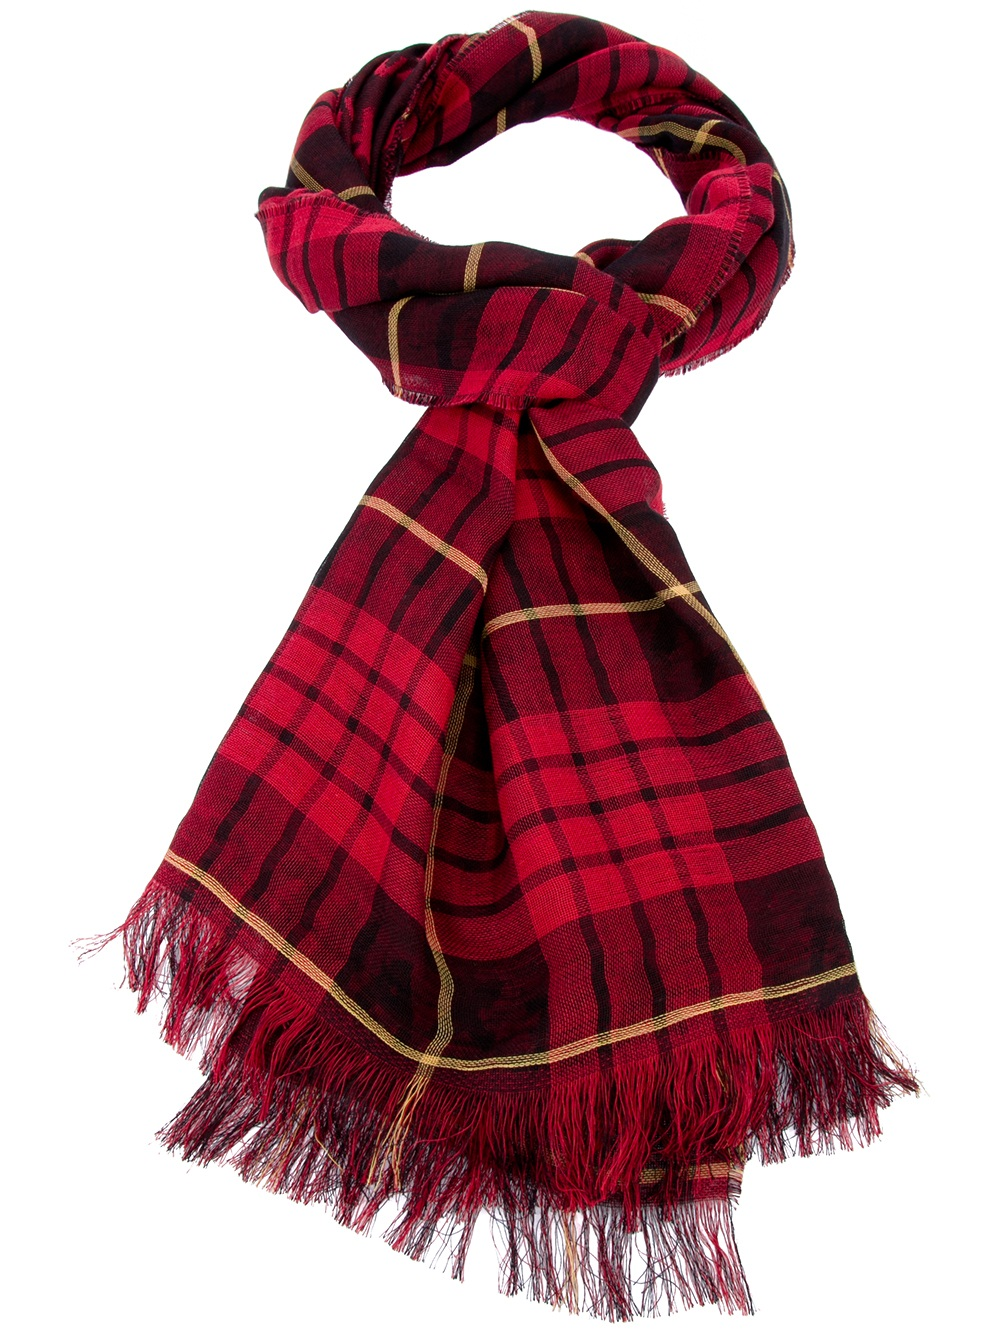 to wear - Mcqueen alexander scarf red photo video